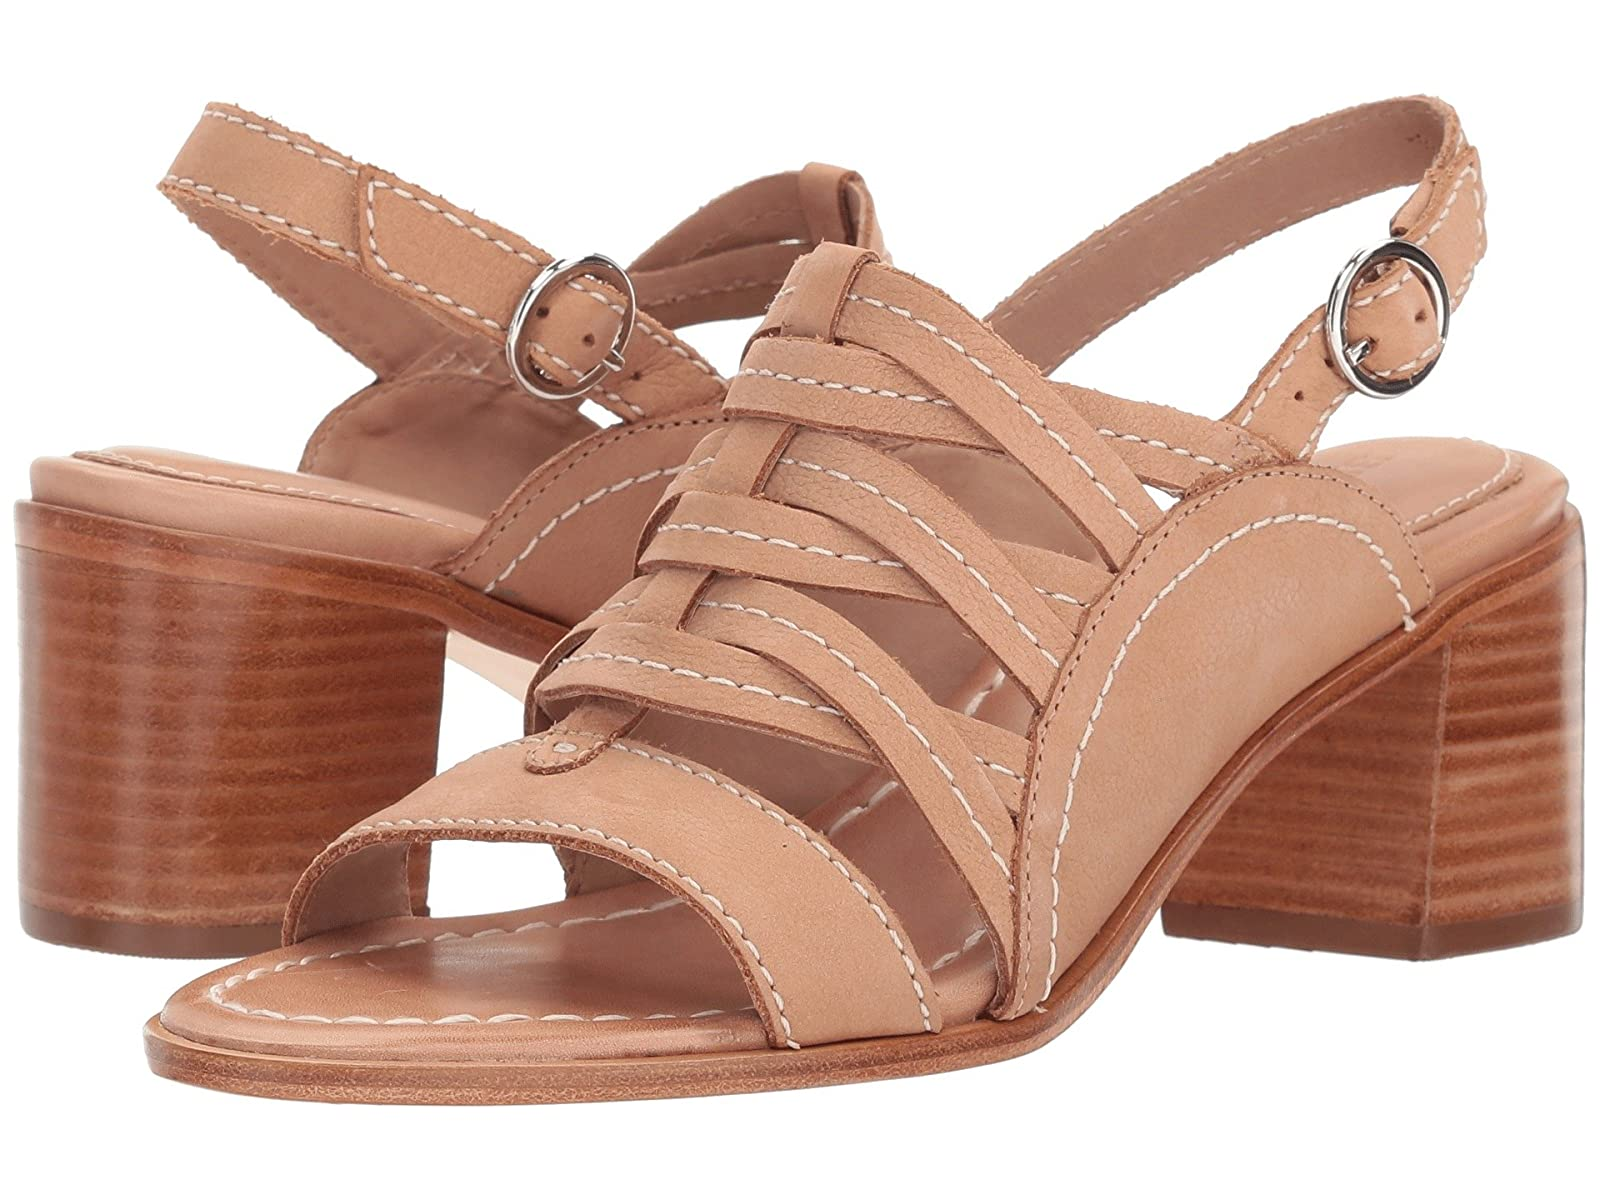 Bernardo BlaineCheap and distinctive eye-catching shoes